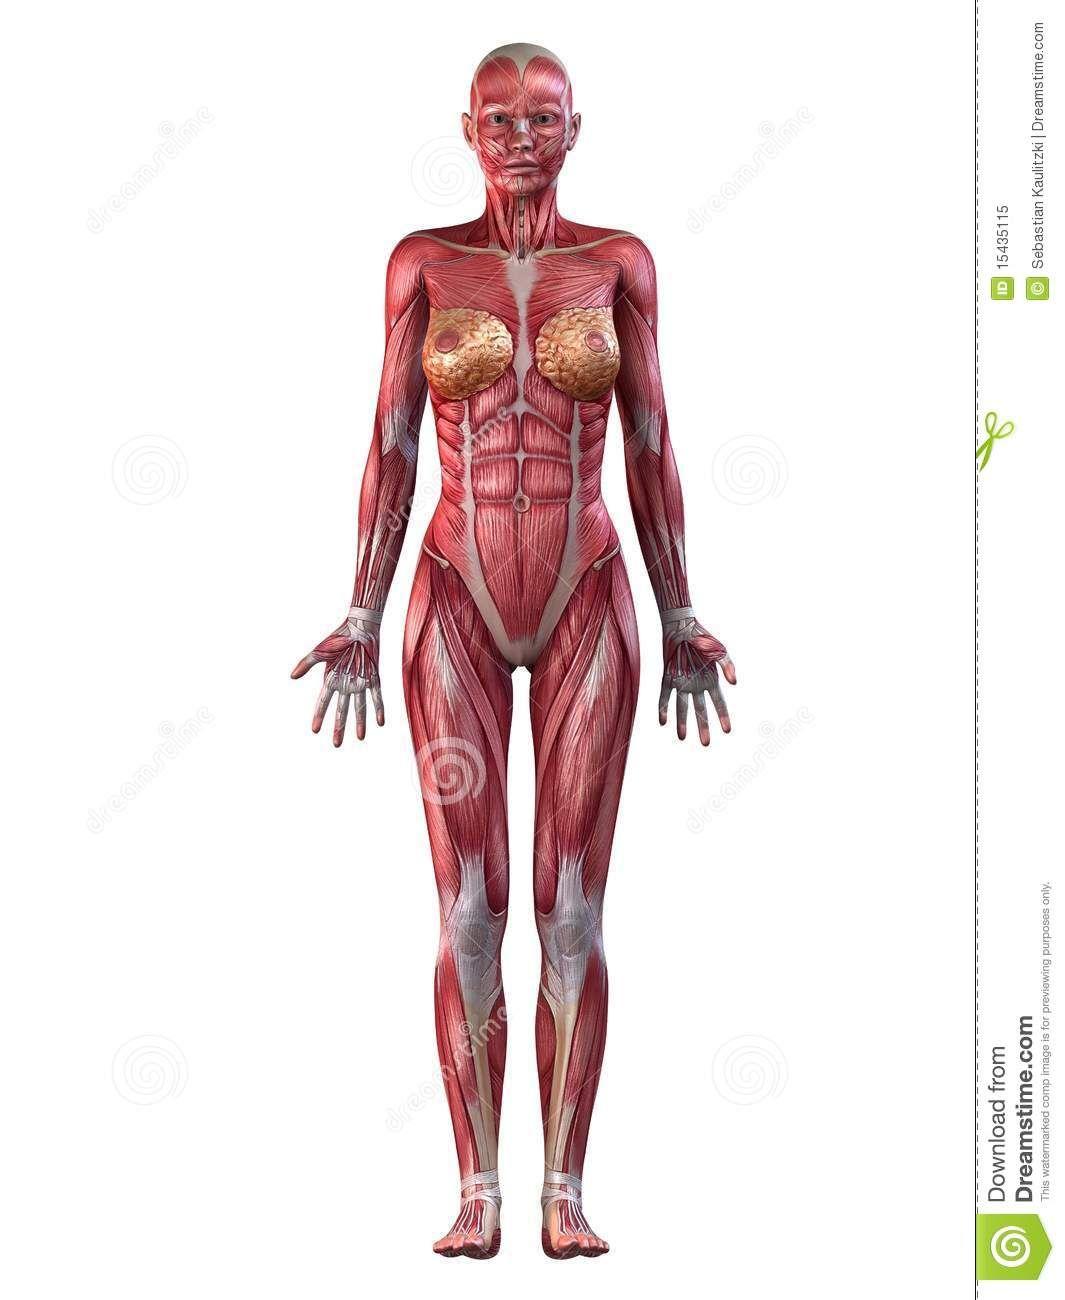 sistema muscular femenino - Buscar con Google | Tema 3 Salut ...